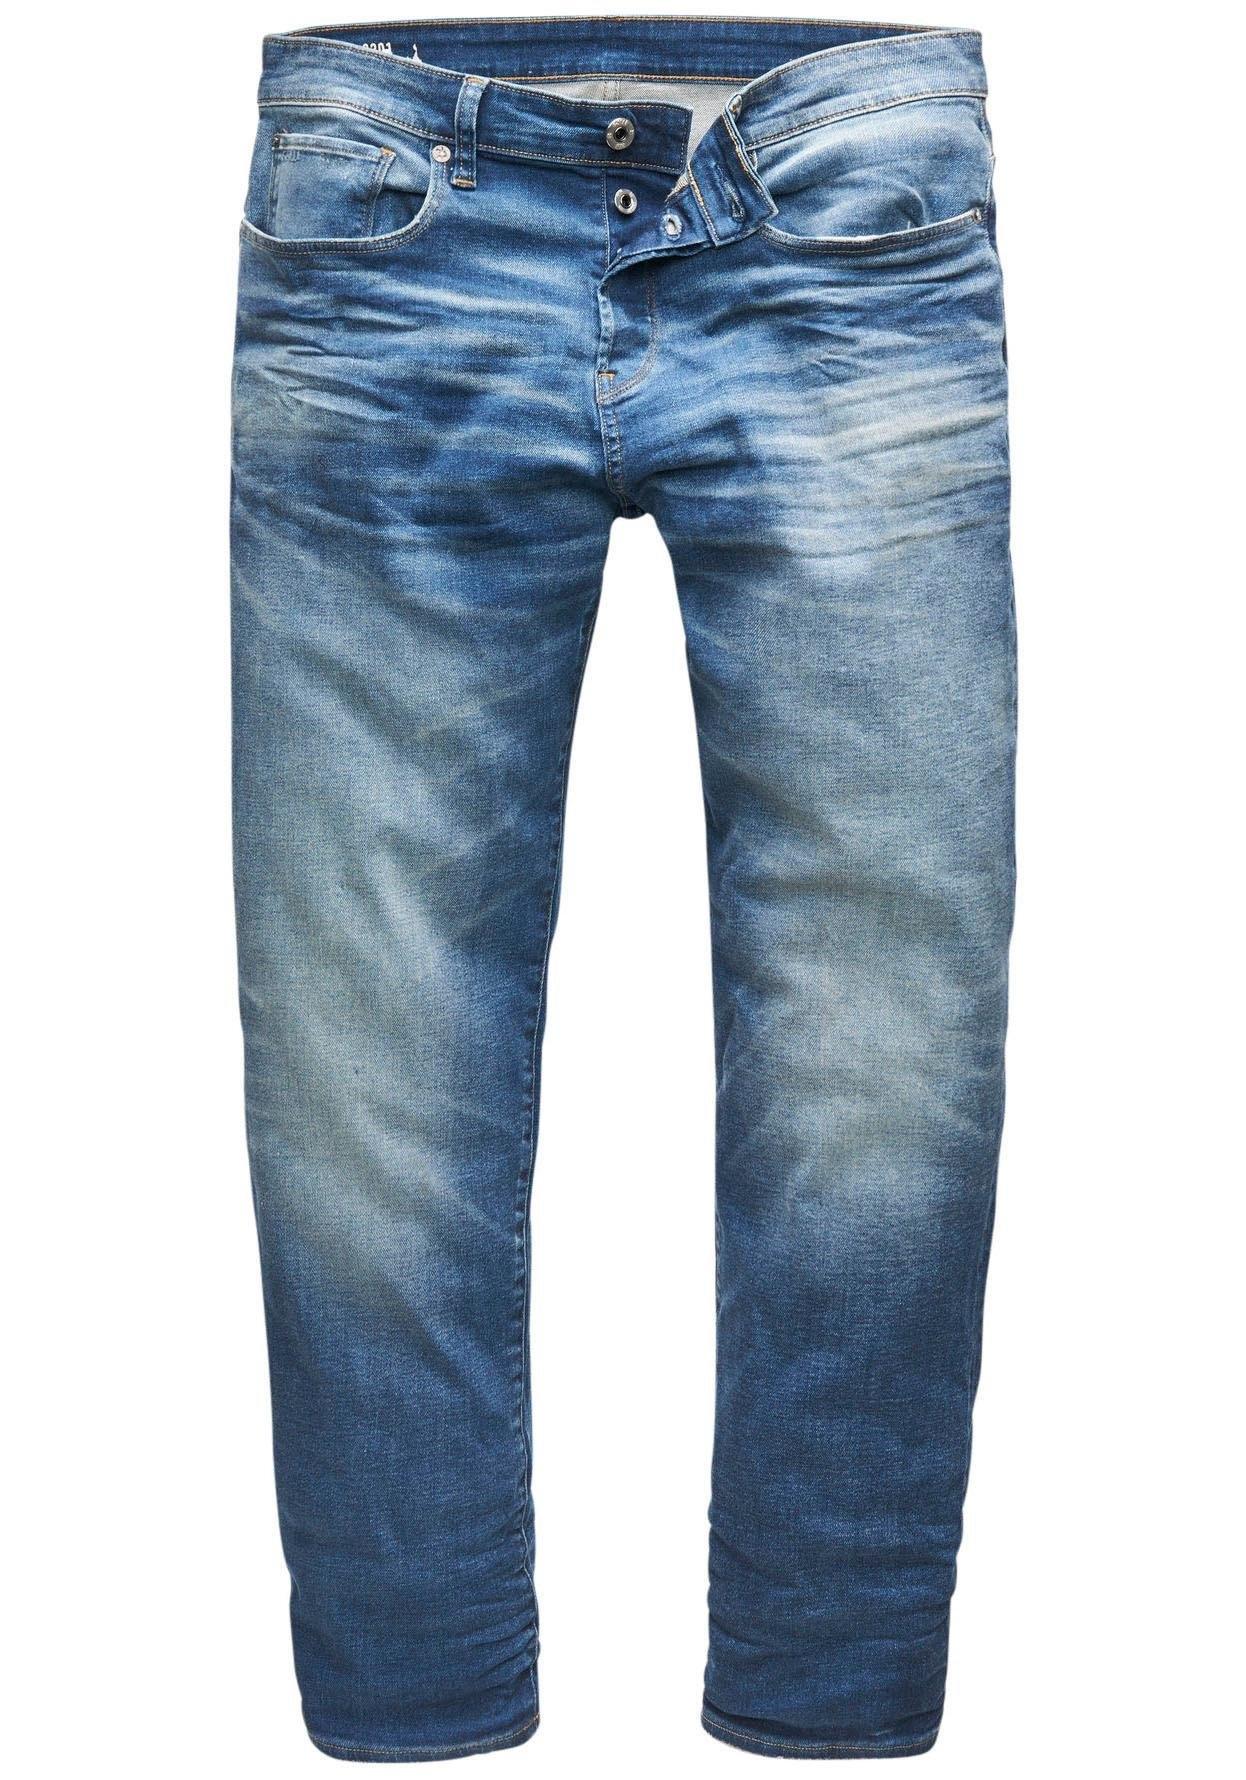 G-star Raw stretch jeans »3301 Loose« goedkoop op otto.nl kopen